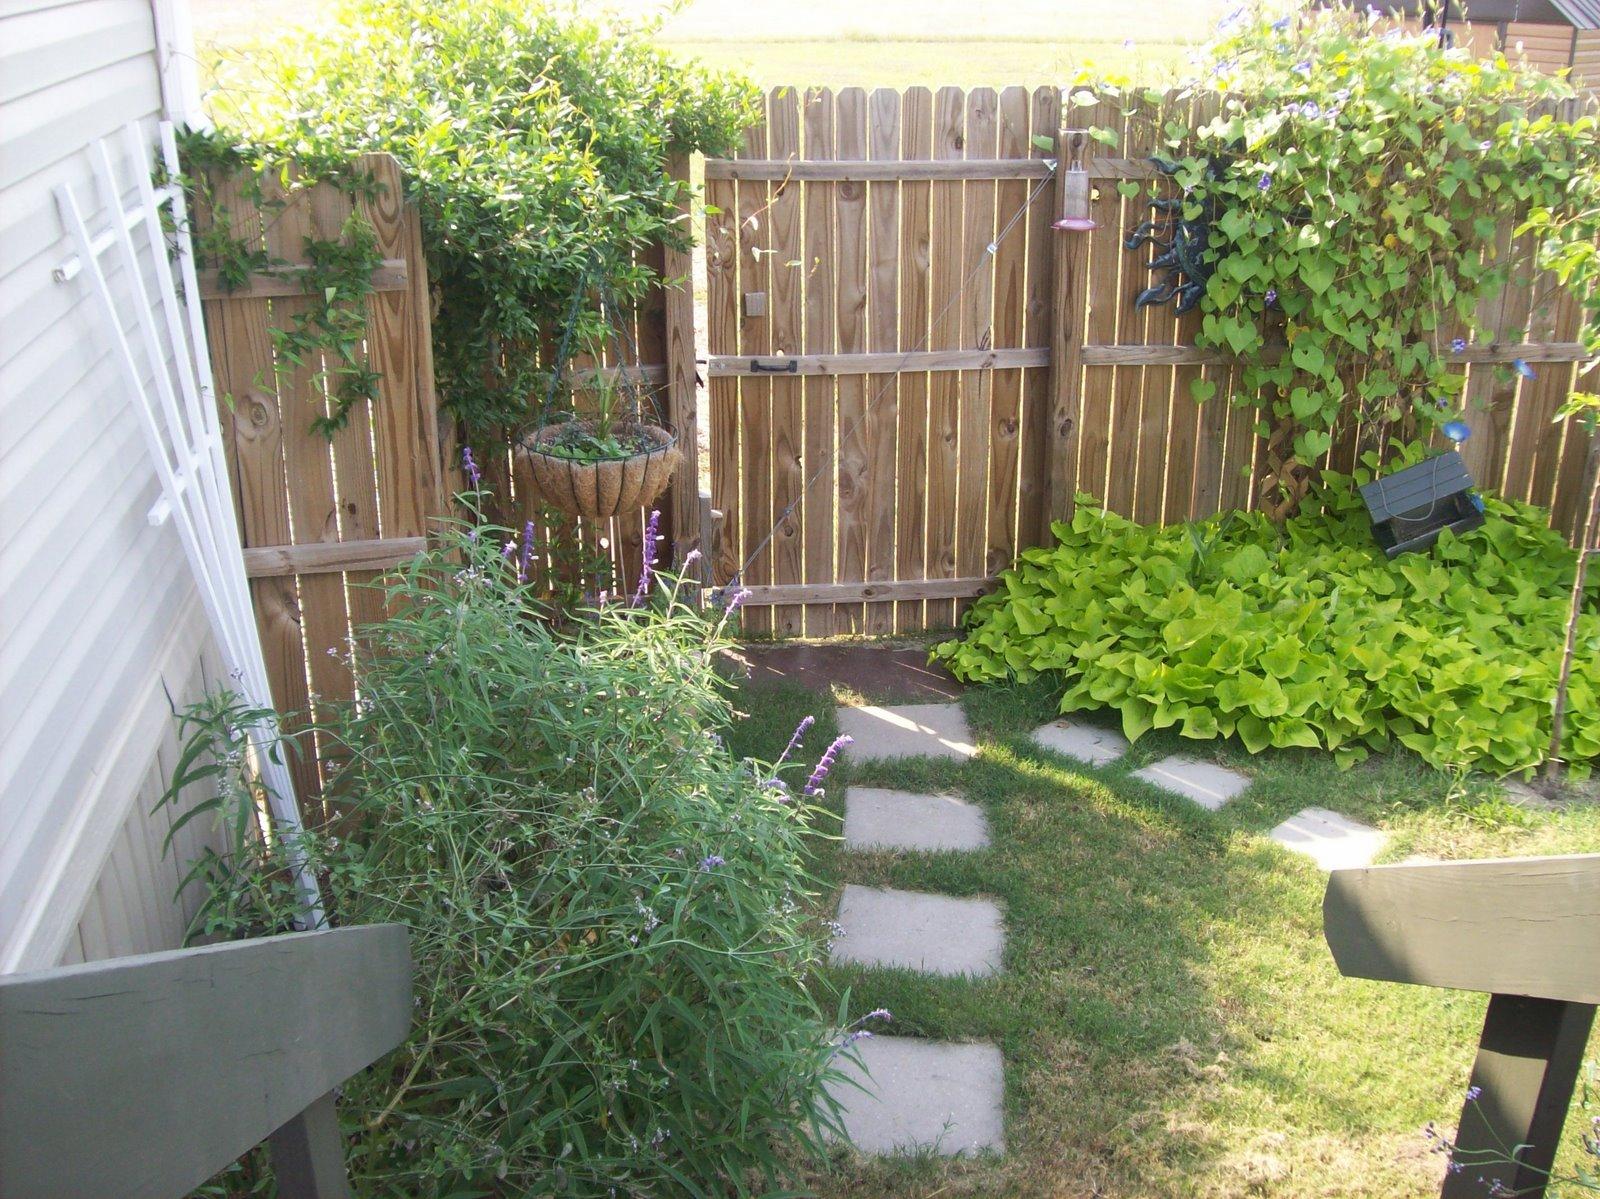 gardening 4 life backyard makeover